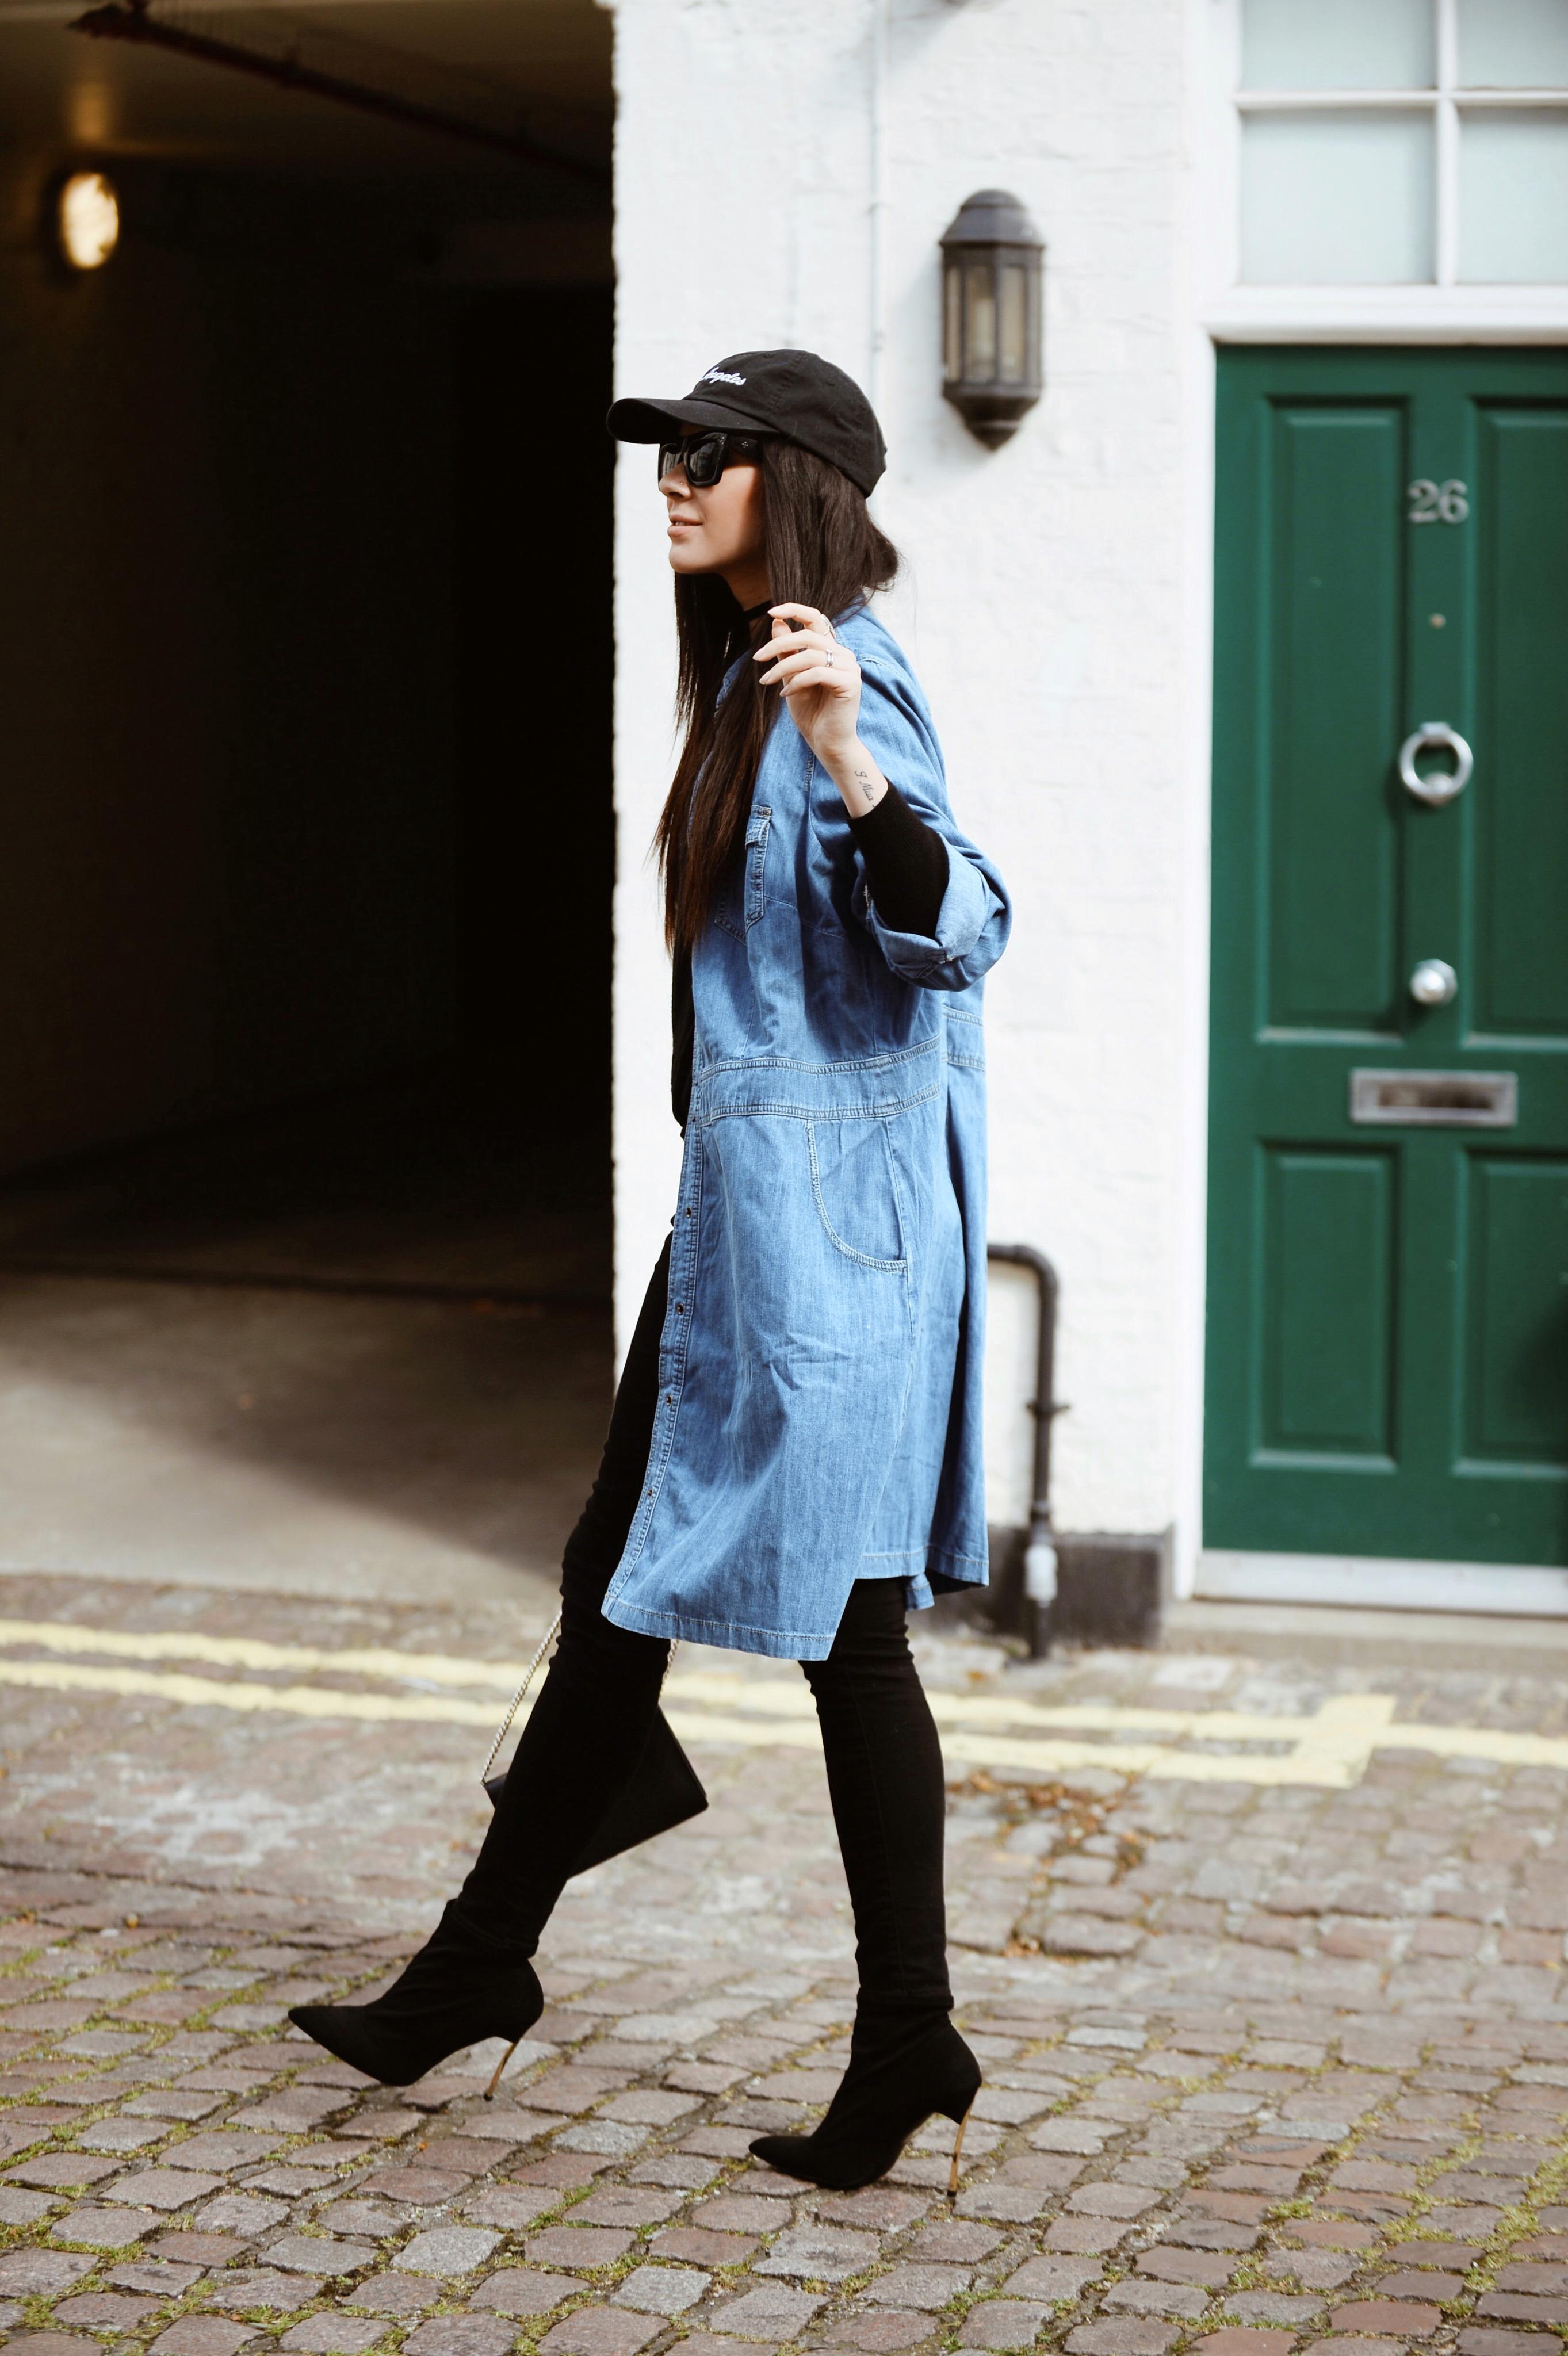 Heels, levi's jeans, denim jacket , cap and sunnies